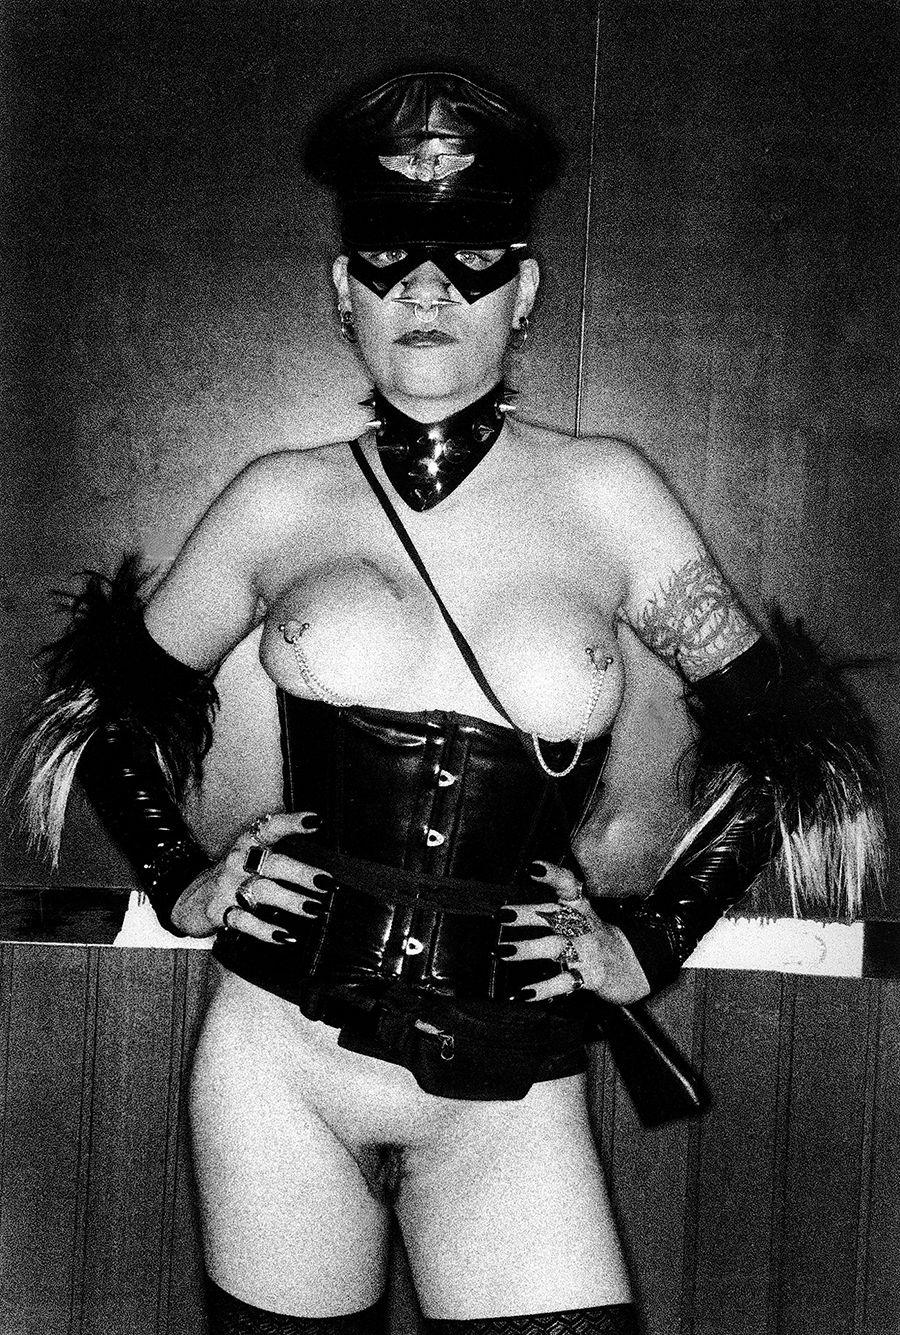 med-Tony_Ward_photography_documentary_wasteland_party_amsterdam_netherlands_fetish_bondage_fashion_erotica_kink_porn_lust_piercings_gay_straight_dance_music_fun_international_parties_transgender_2-L